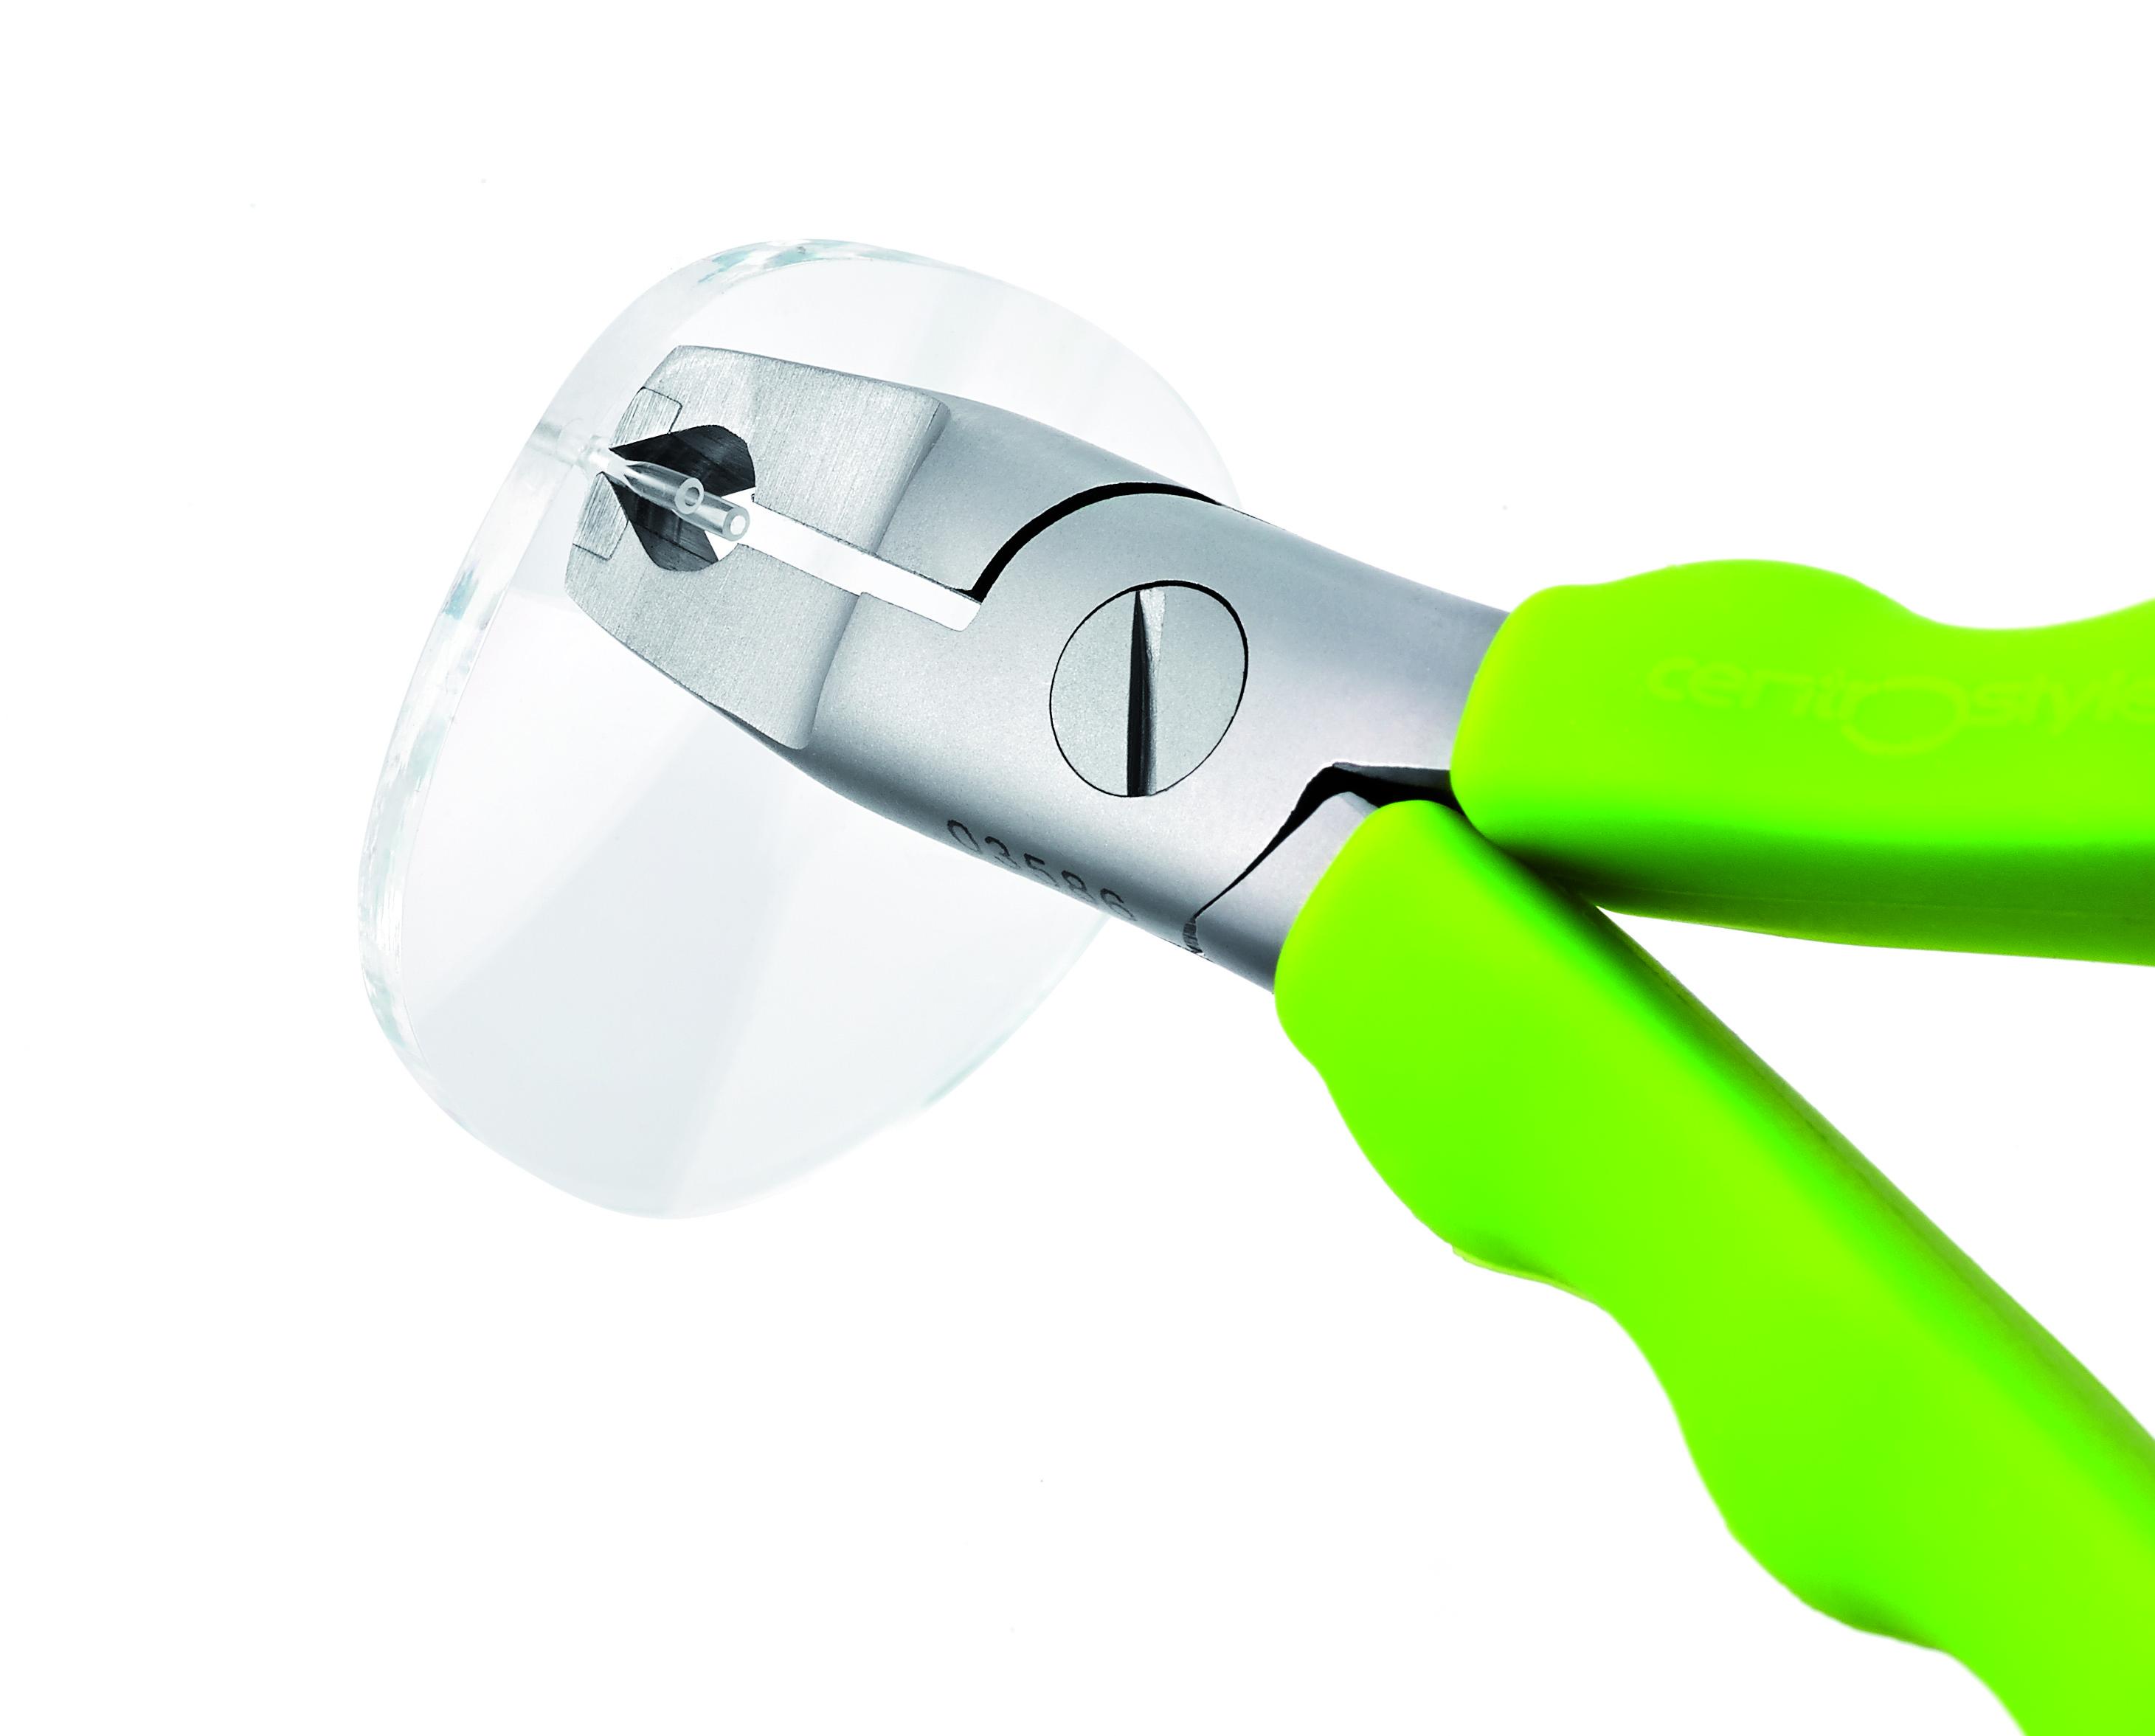 0203586N-Alicate Corte Widia Pino Plástico Mod 3586N - Contém 1 Peça  - ENTREGA IMEDIATA